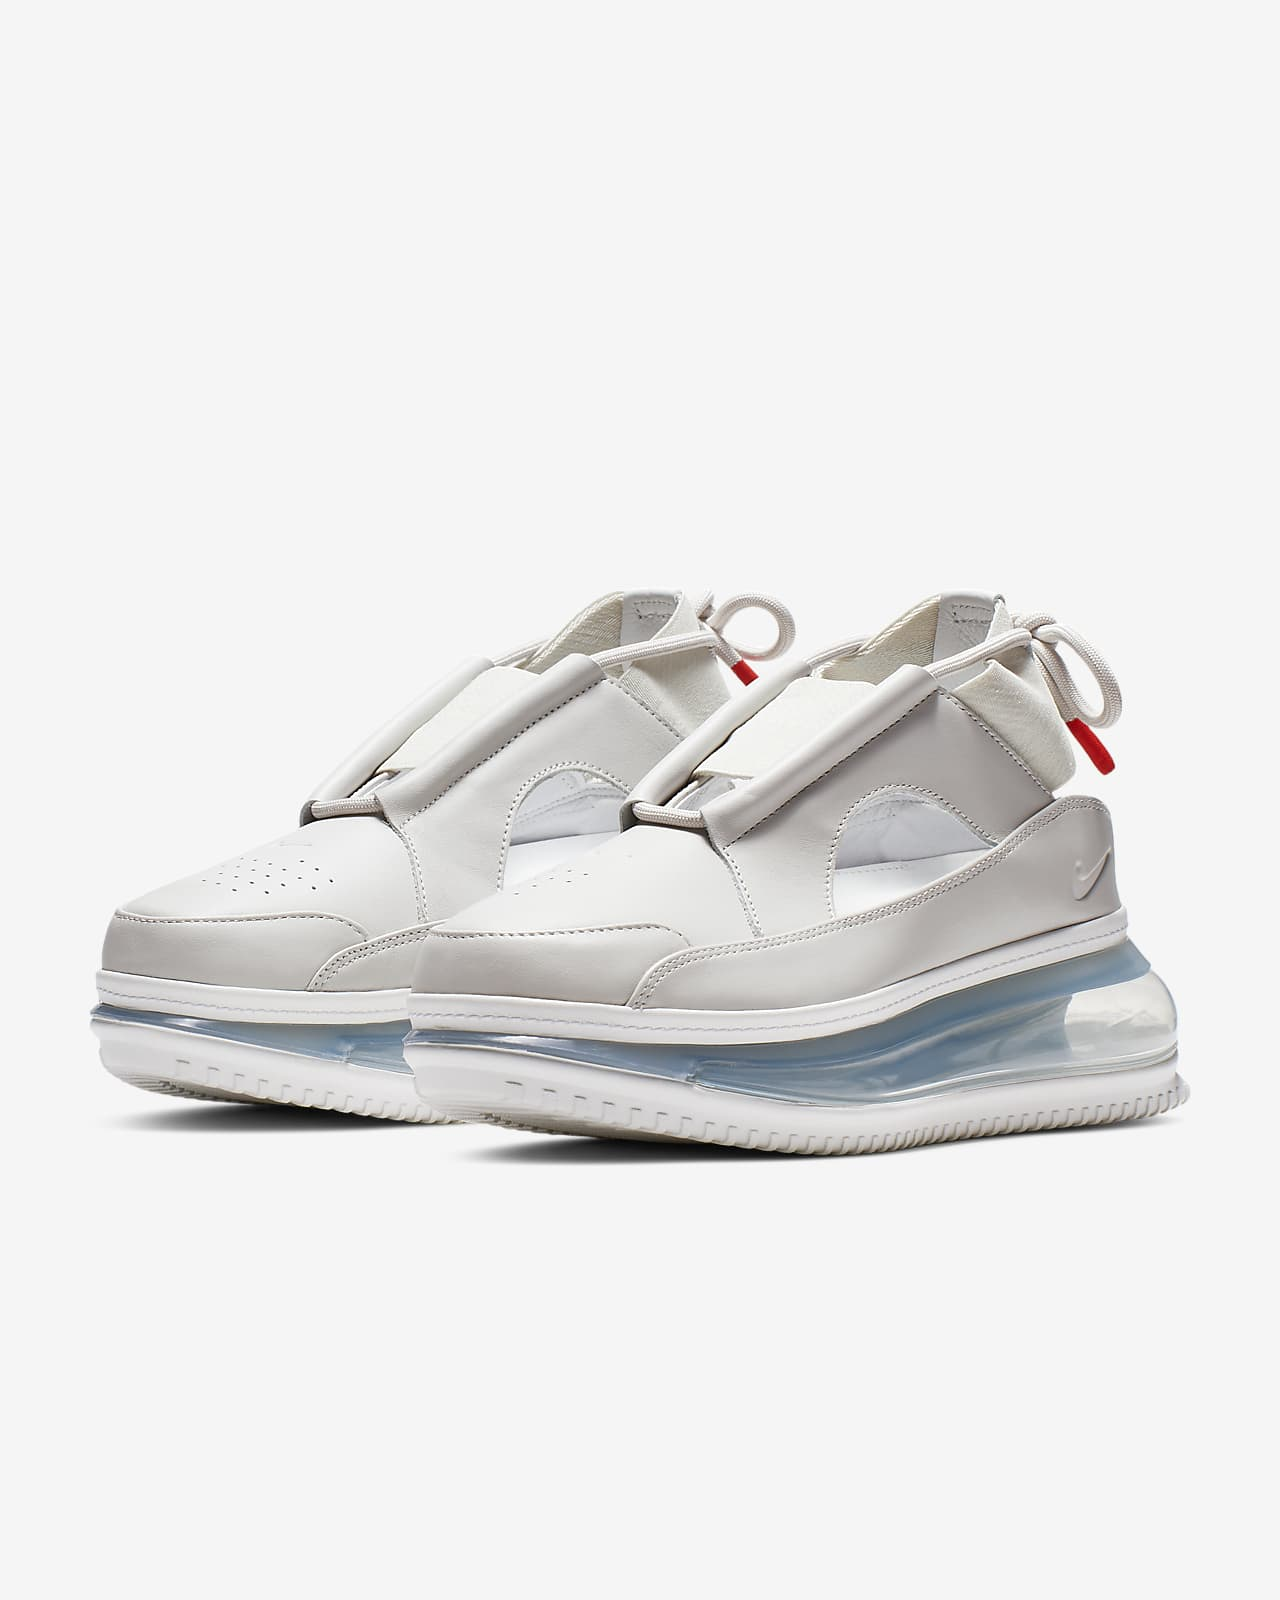 Nike Air Max Ff 720 Women S Shoe Nike In